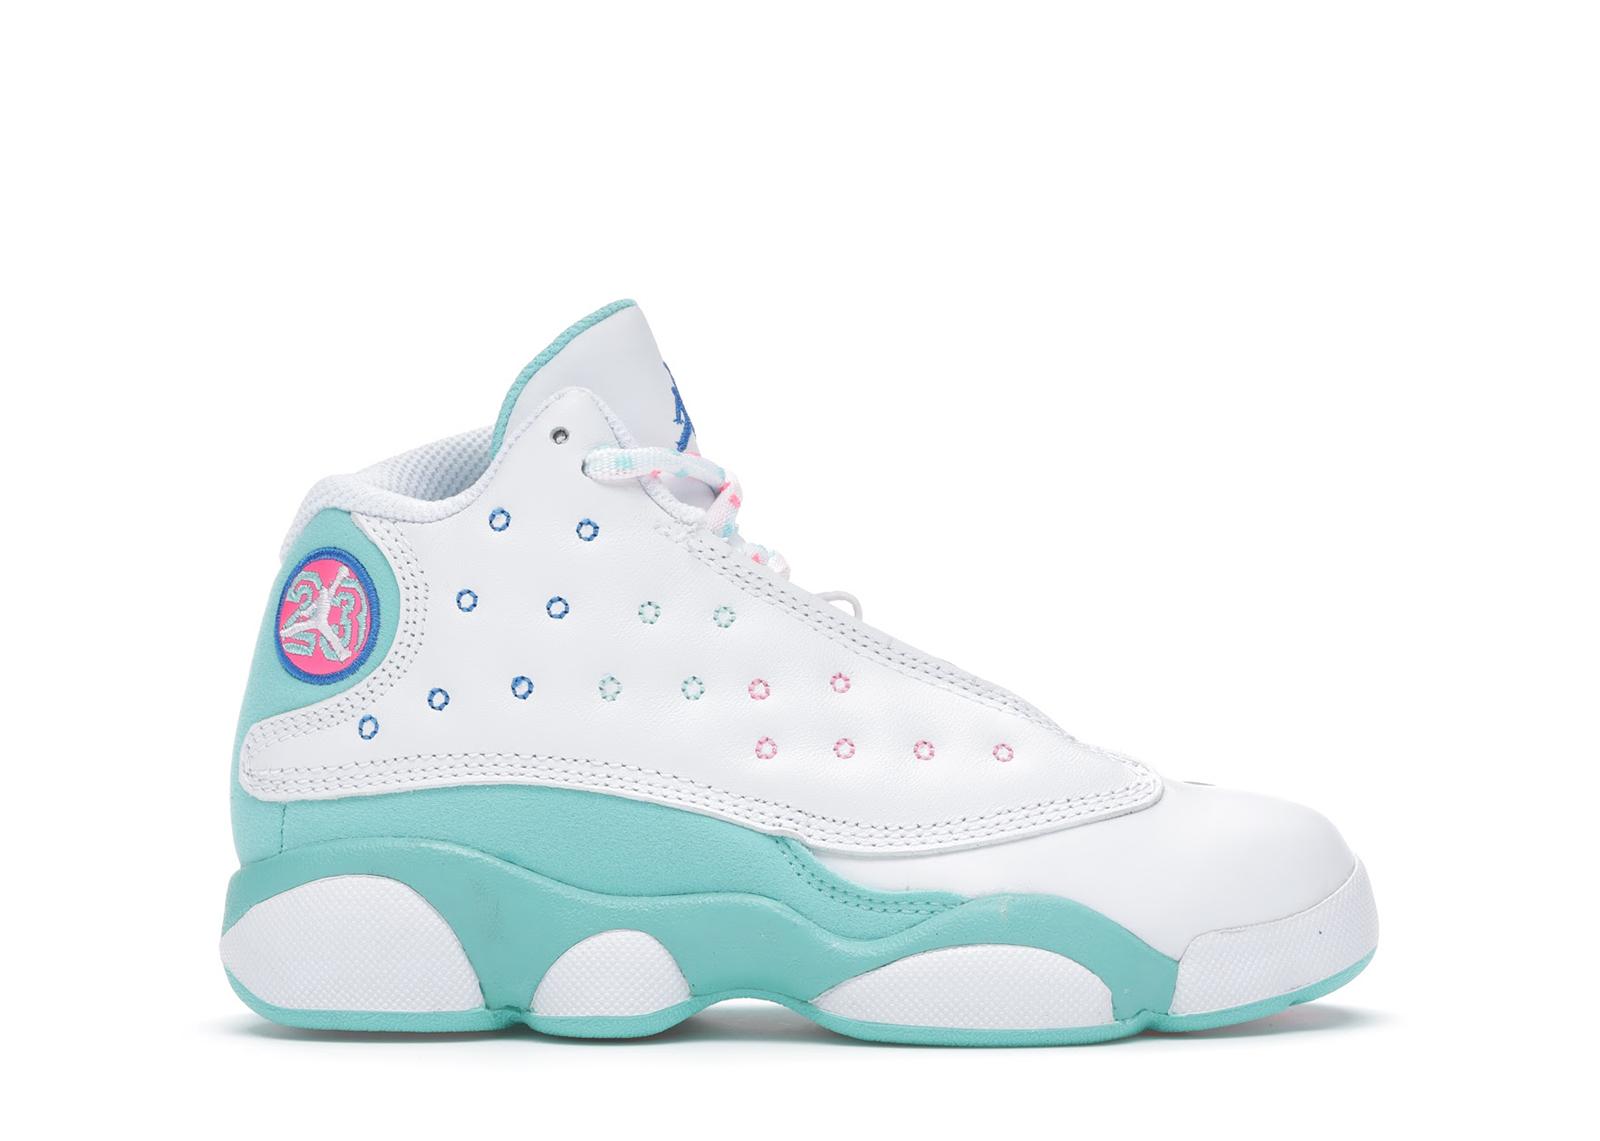 Jordan 13 Retro White Soar Green Pink